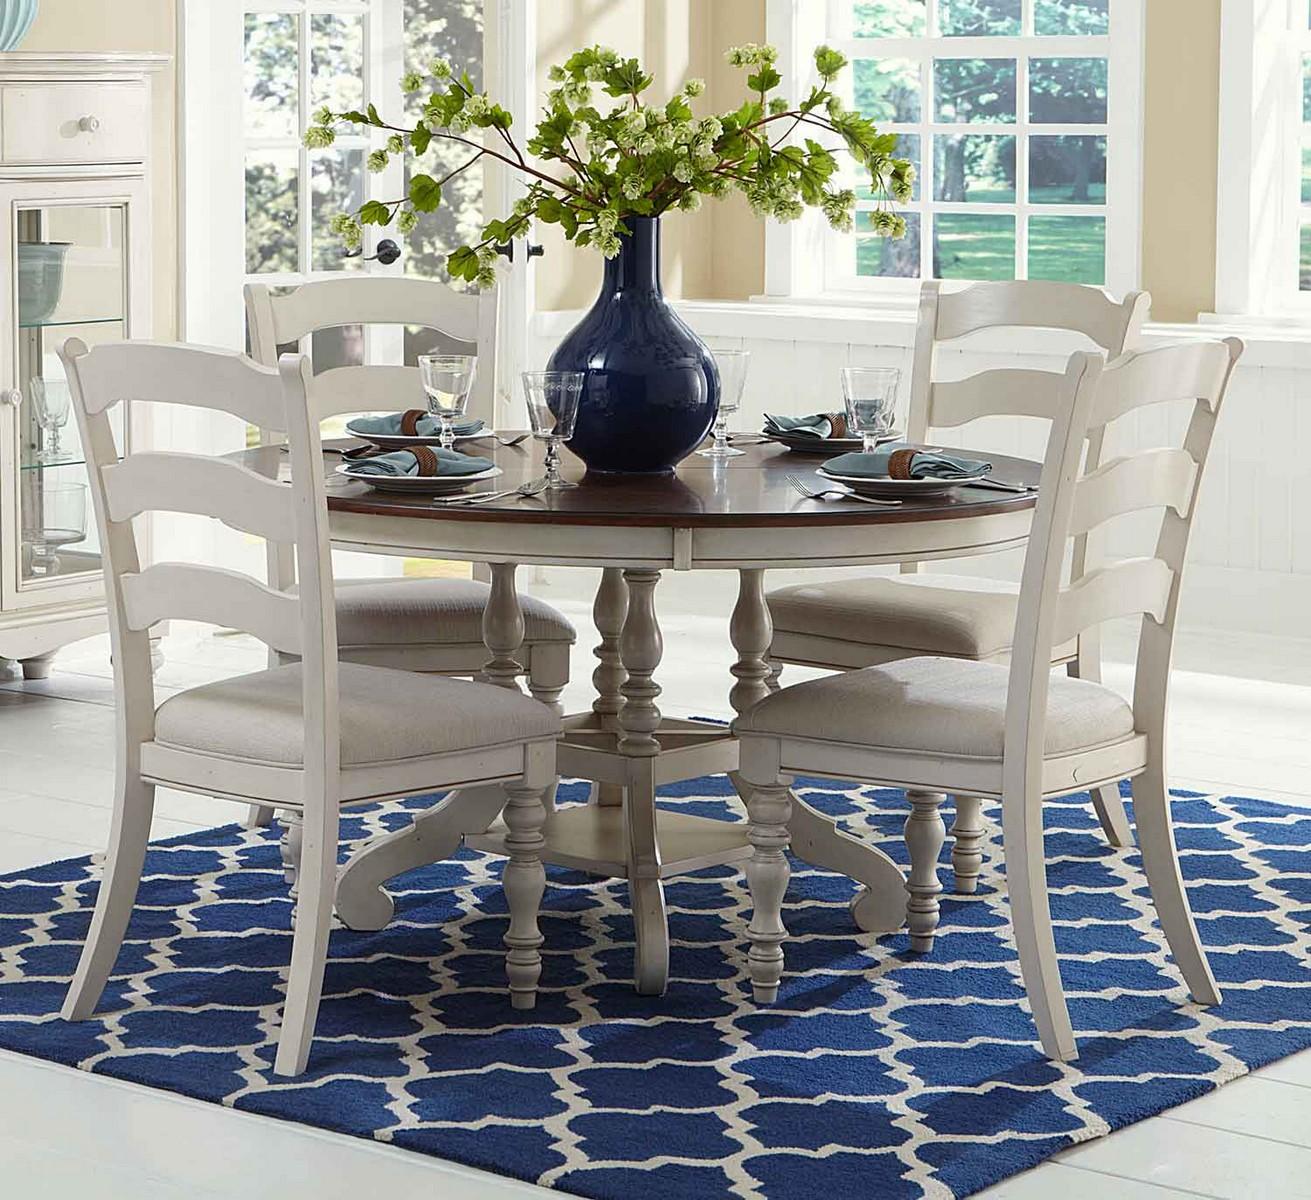 Hillsdale Pine Island 5PC Round Dining Set   Old White